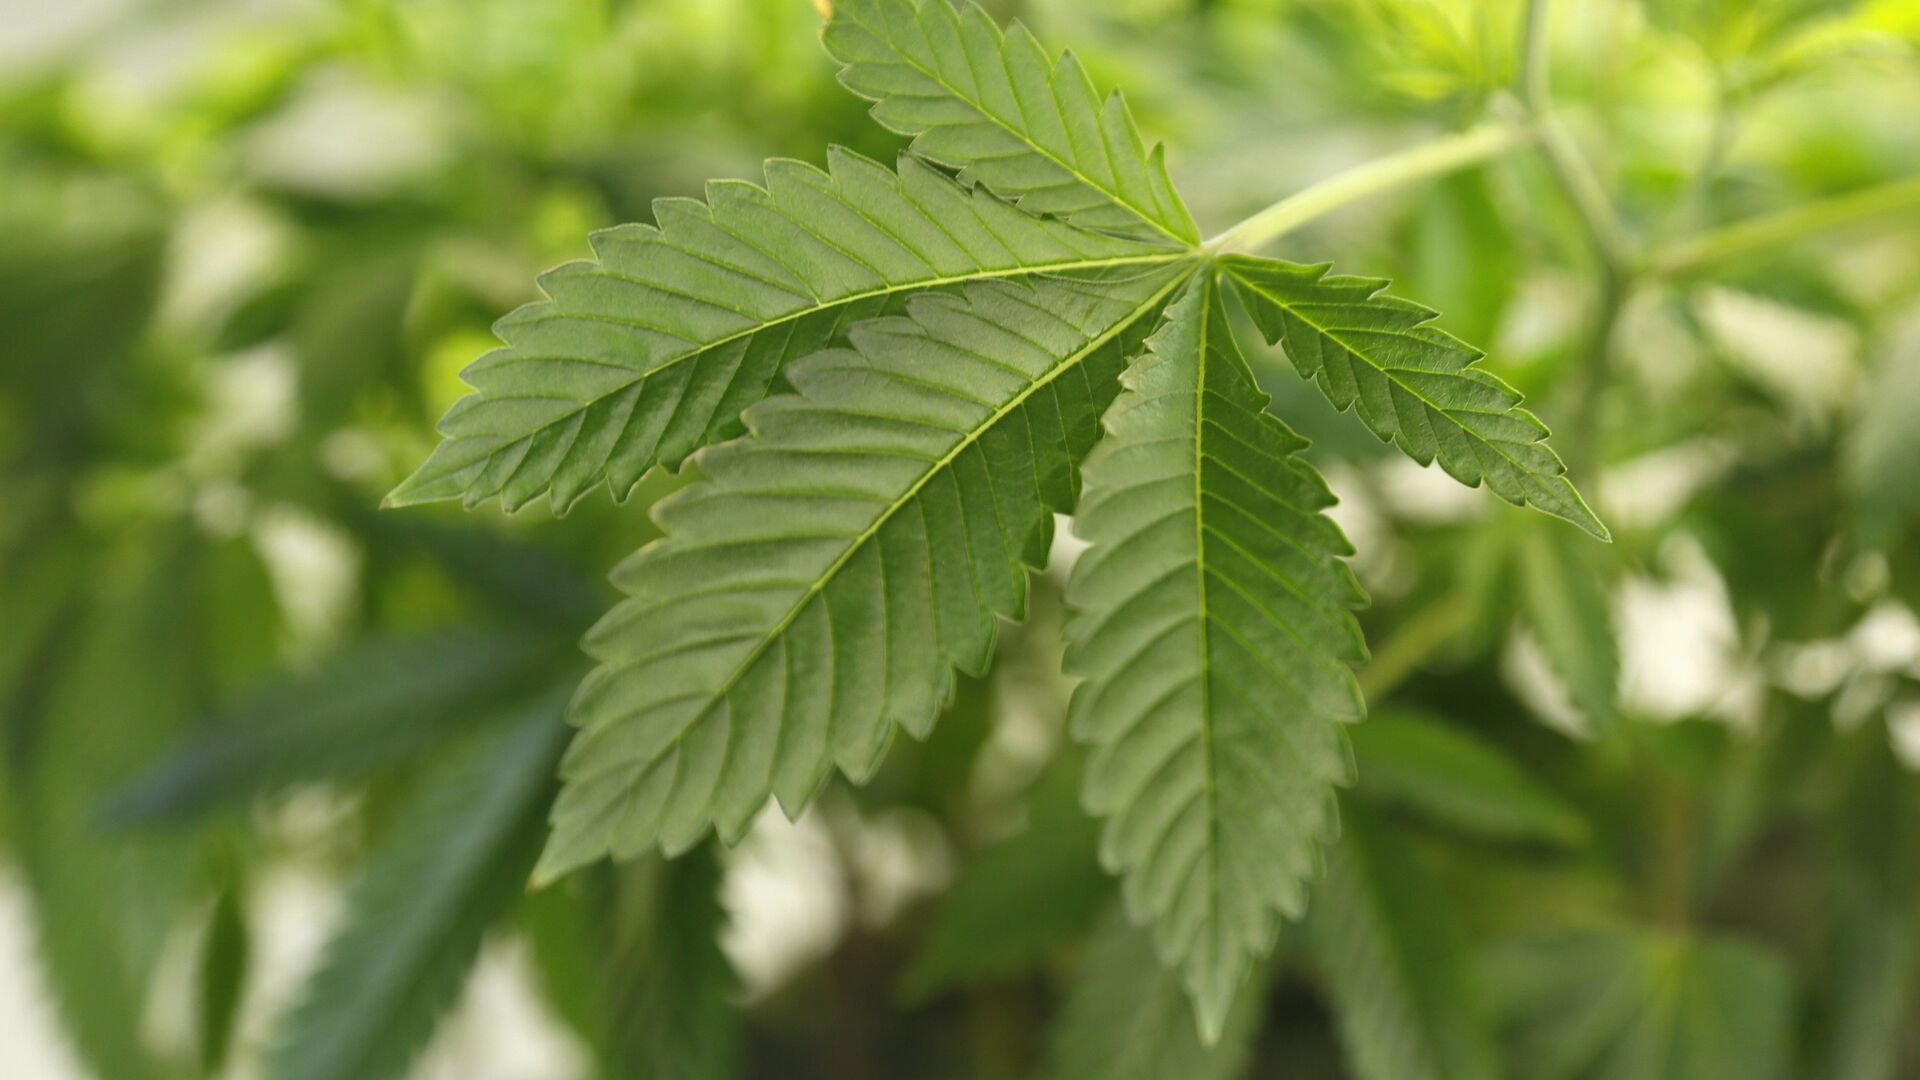 A thriving marijuana plant is seen at a grow operation in Denver, Colorado  - Sputnik Mundo, 1920, 04.08.2021